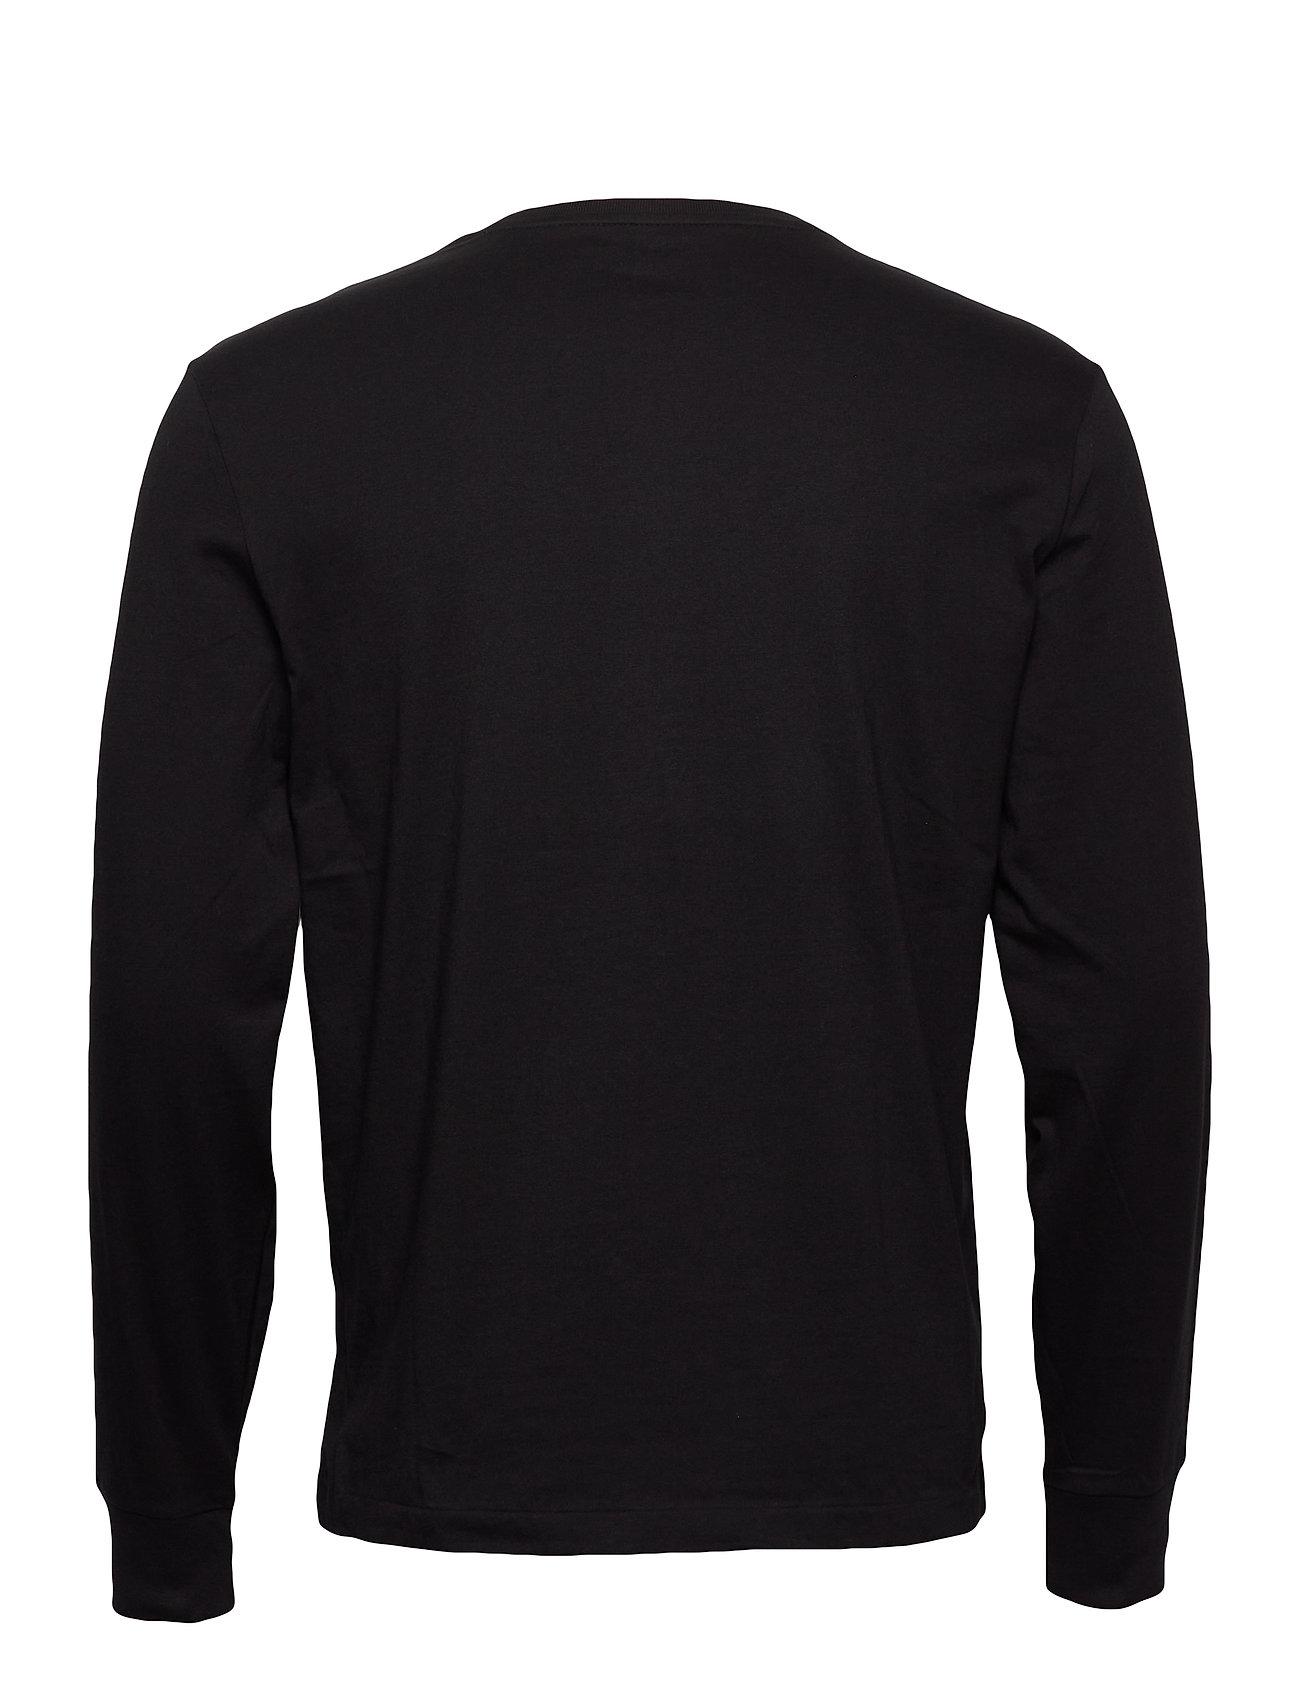 Lauren Sleeve Lscncmslm5 shirtpolo long BlackPolo Ralph t LSpGUMqzV